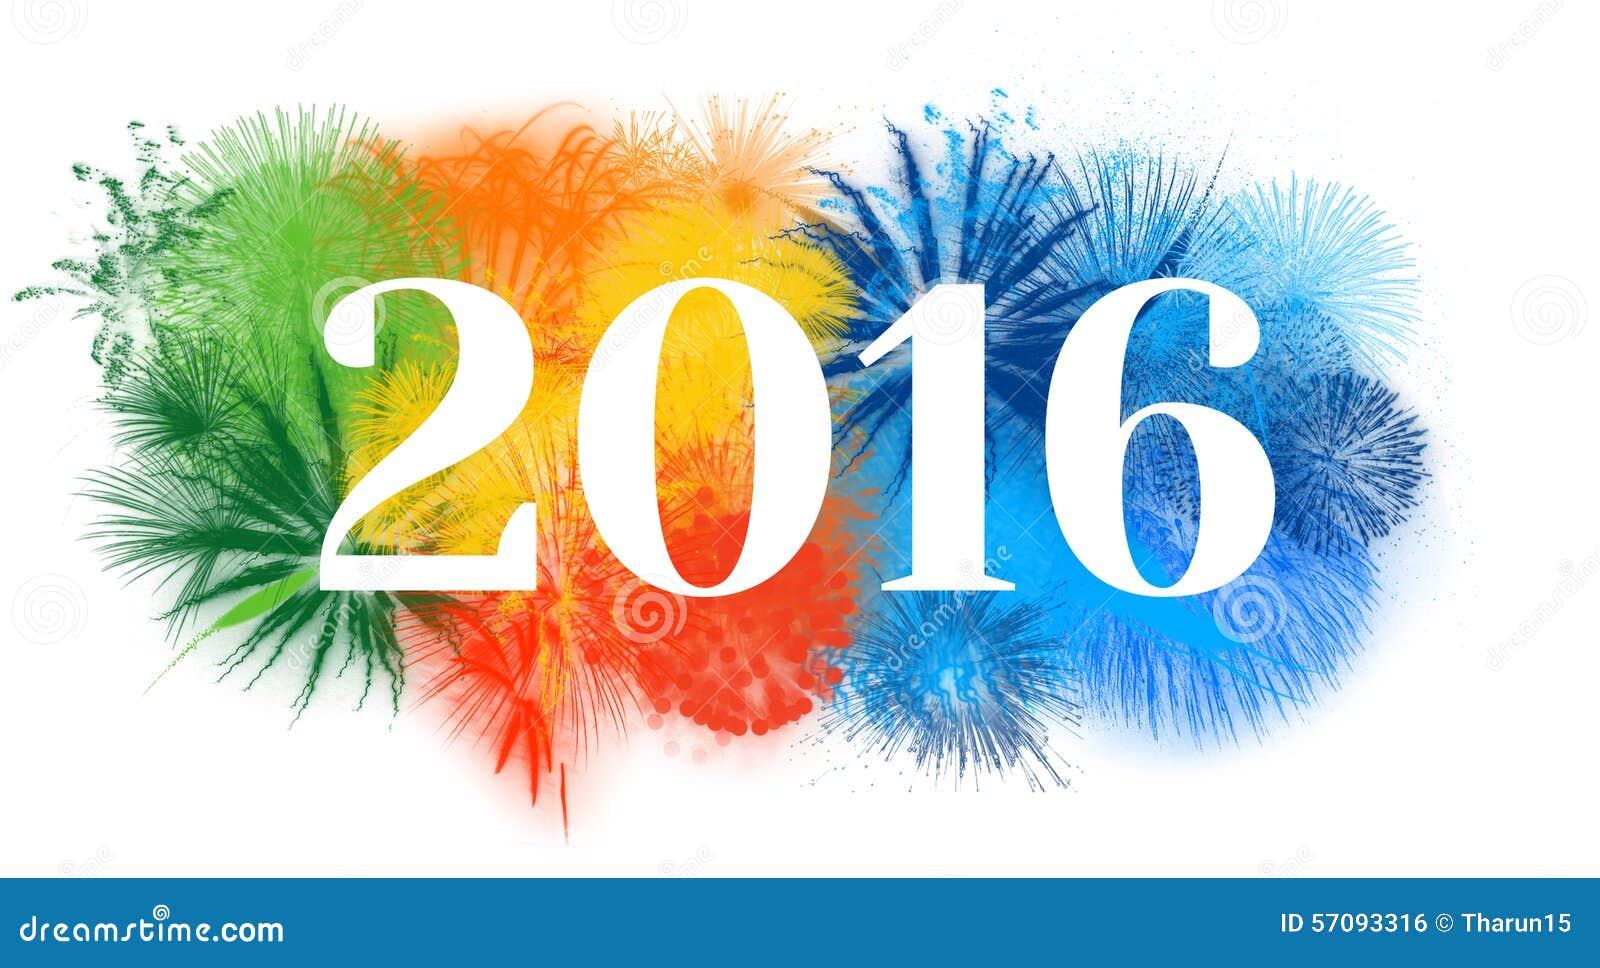 2016 >> 2016 Stock Illustrations 34 209 2016 Stock Illustrations Vectors